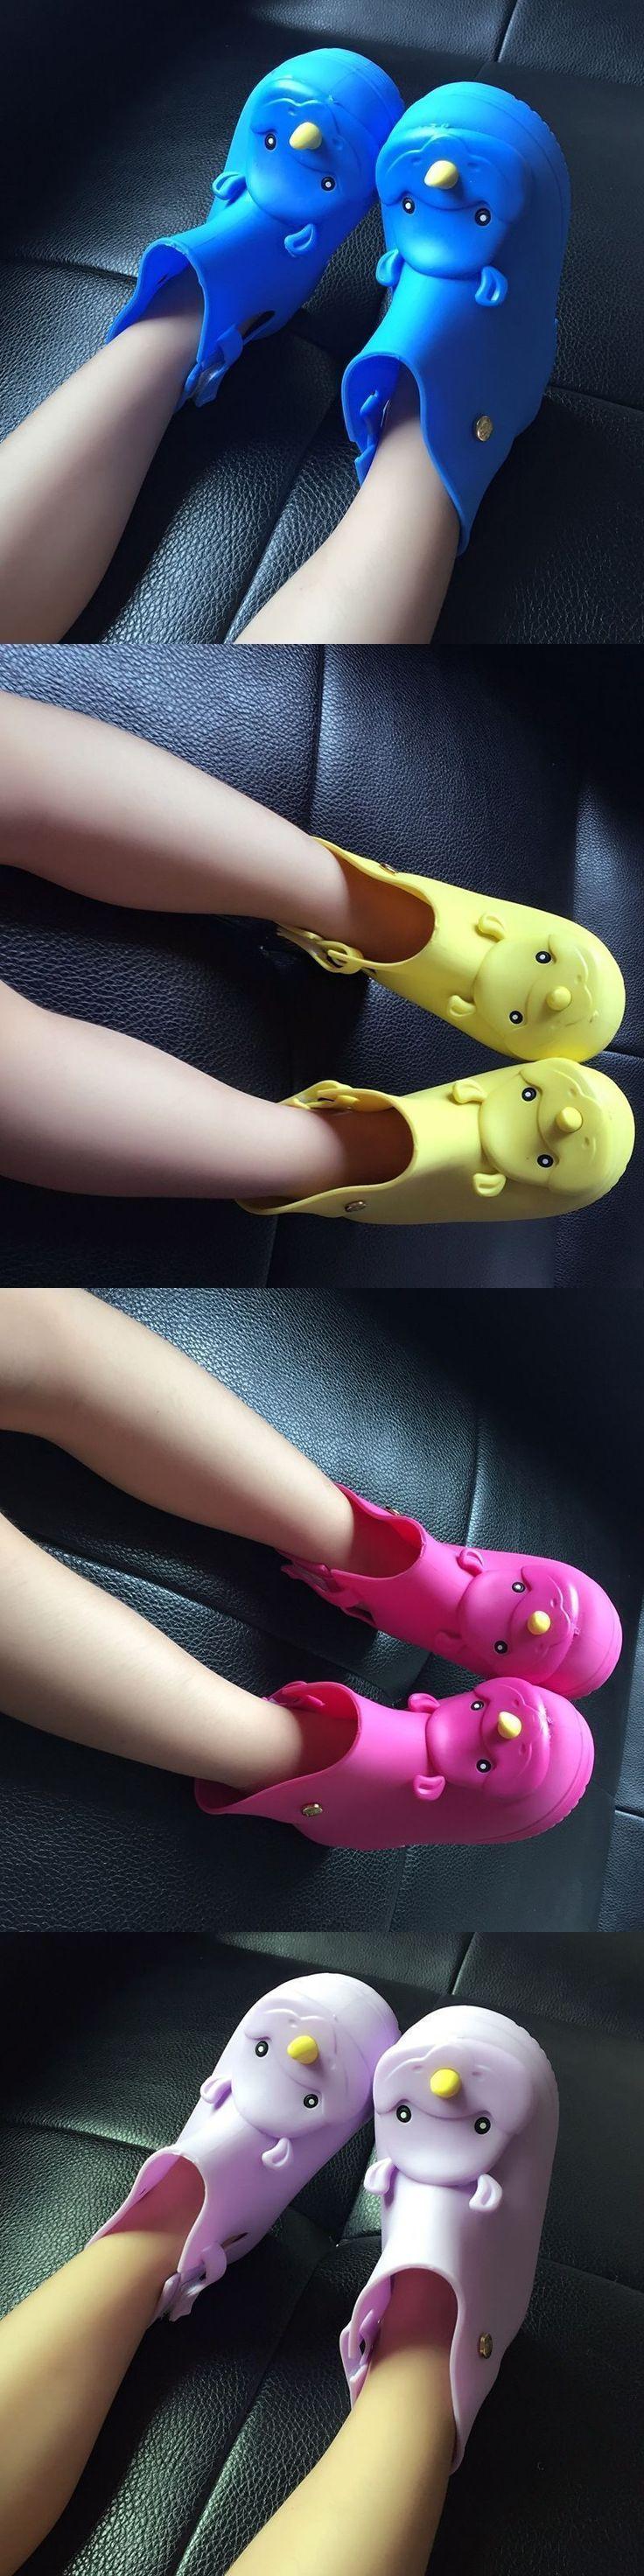 summer Mini Melissa Rhinoceros Head Rain Boots new Non-Slip Children Rain Boots Jelly Shoes Baby Water Boots Shoes Melissa Boots #babyrainboots